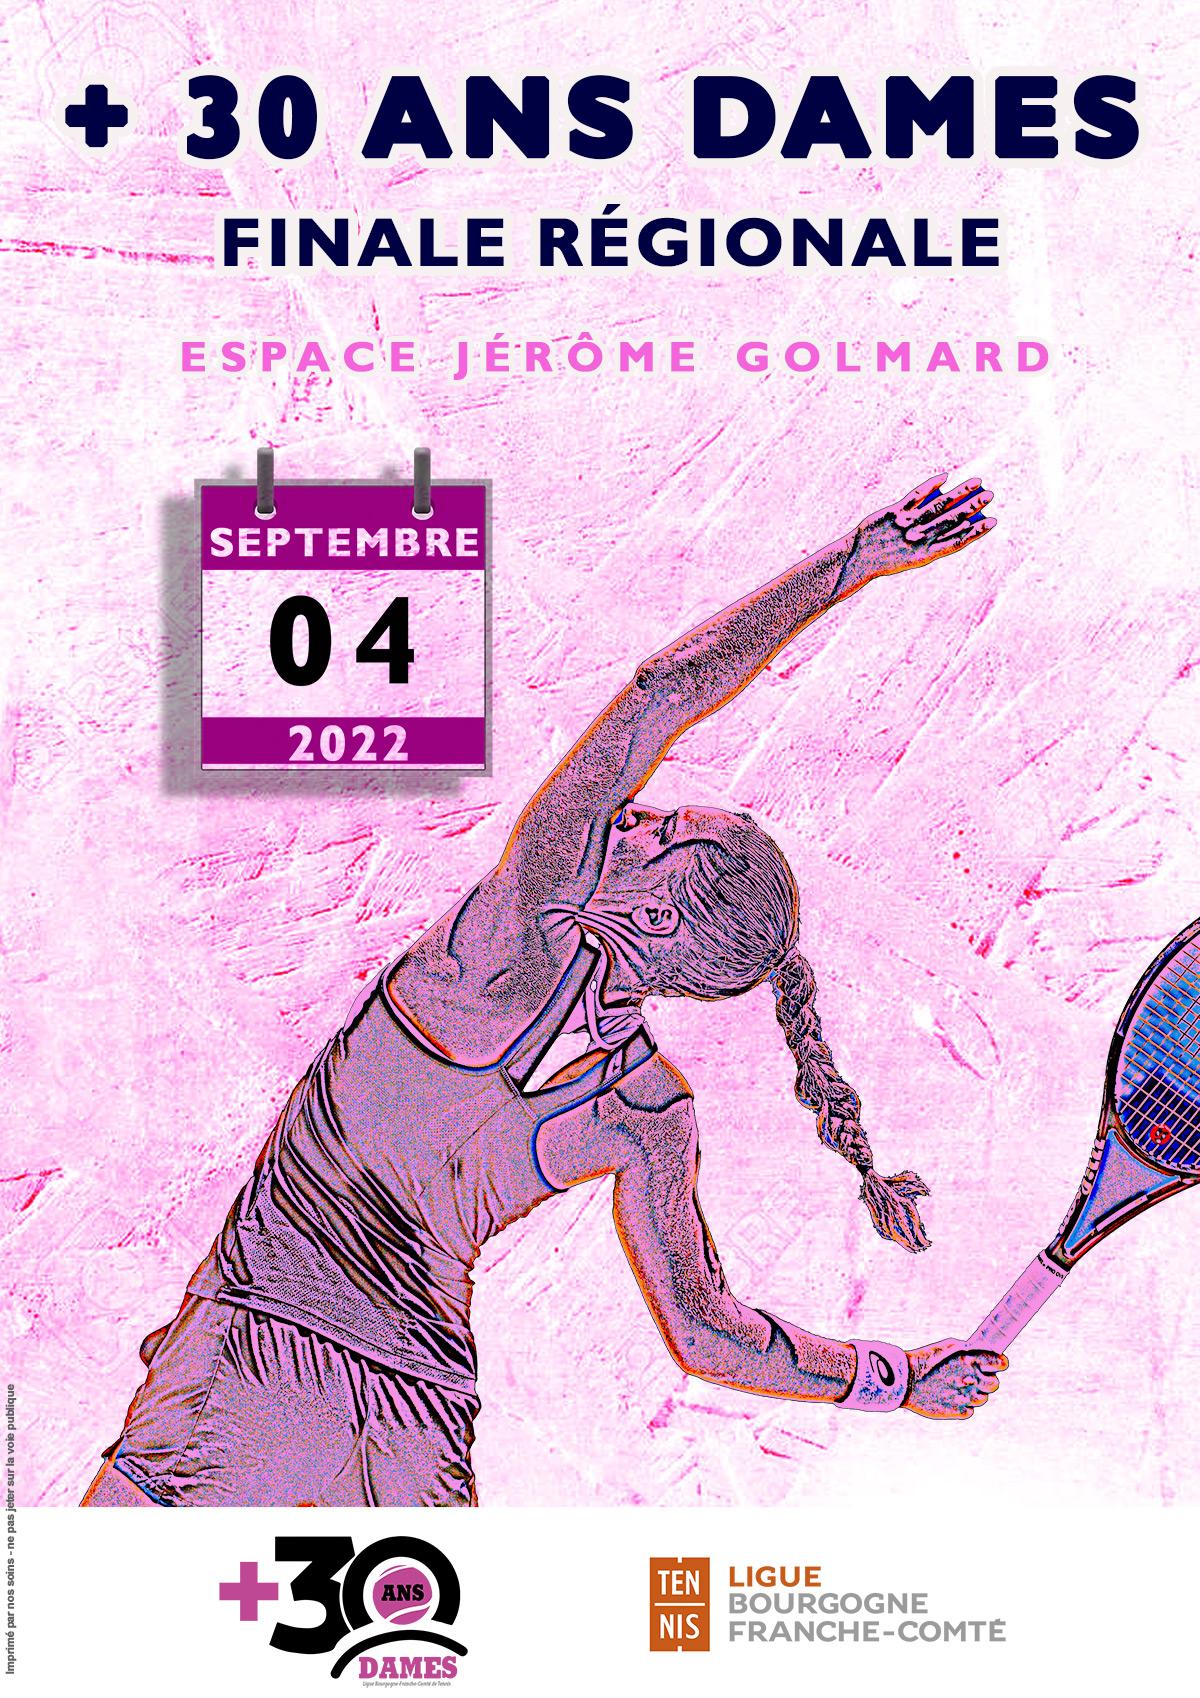 + 30 Ans Dames 2022 : Ligue BFC Tennis